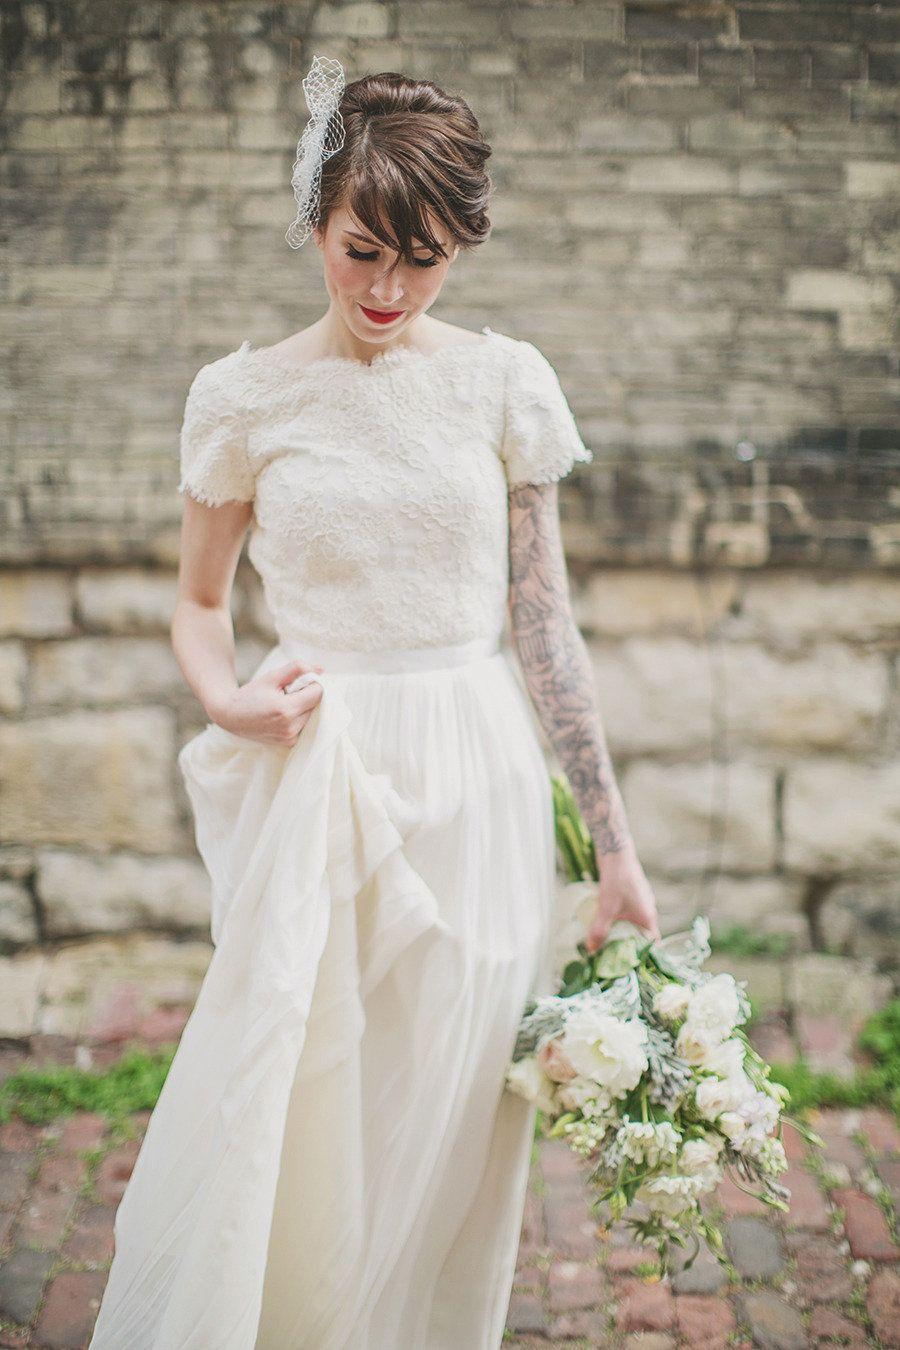 Milwaukee Wedding from Erin Jean Photography | Weddings, Wedding and ...